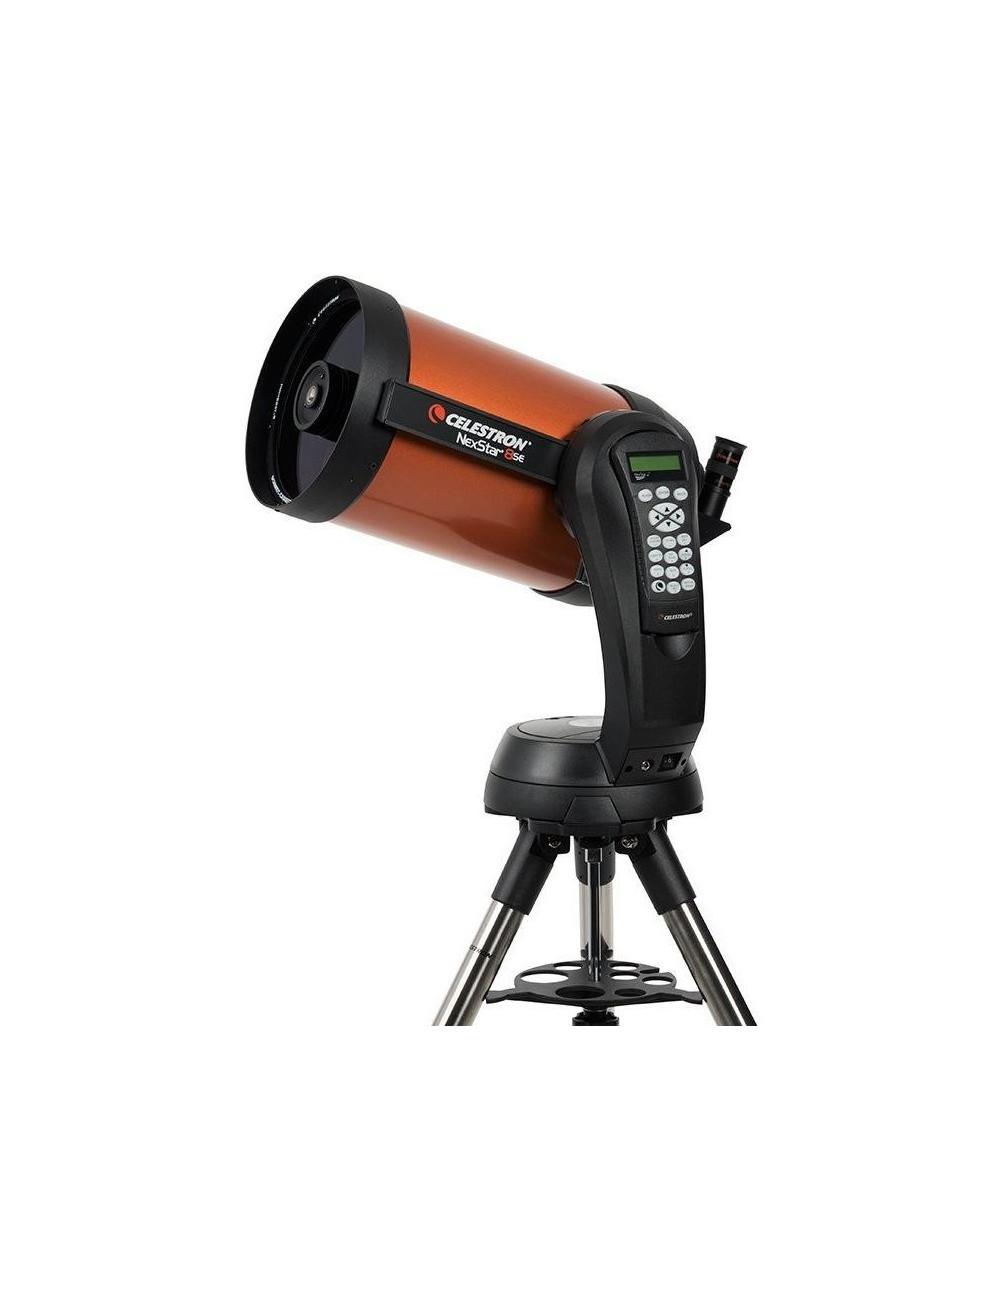 Telescope NexStar 8 SE Celestron